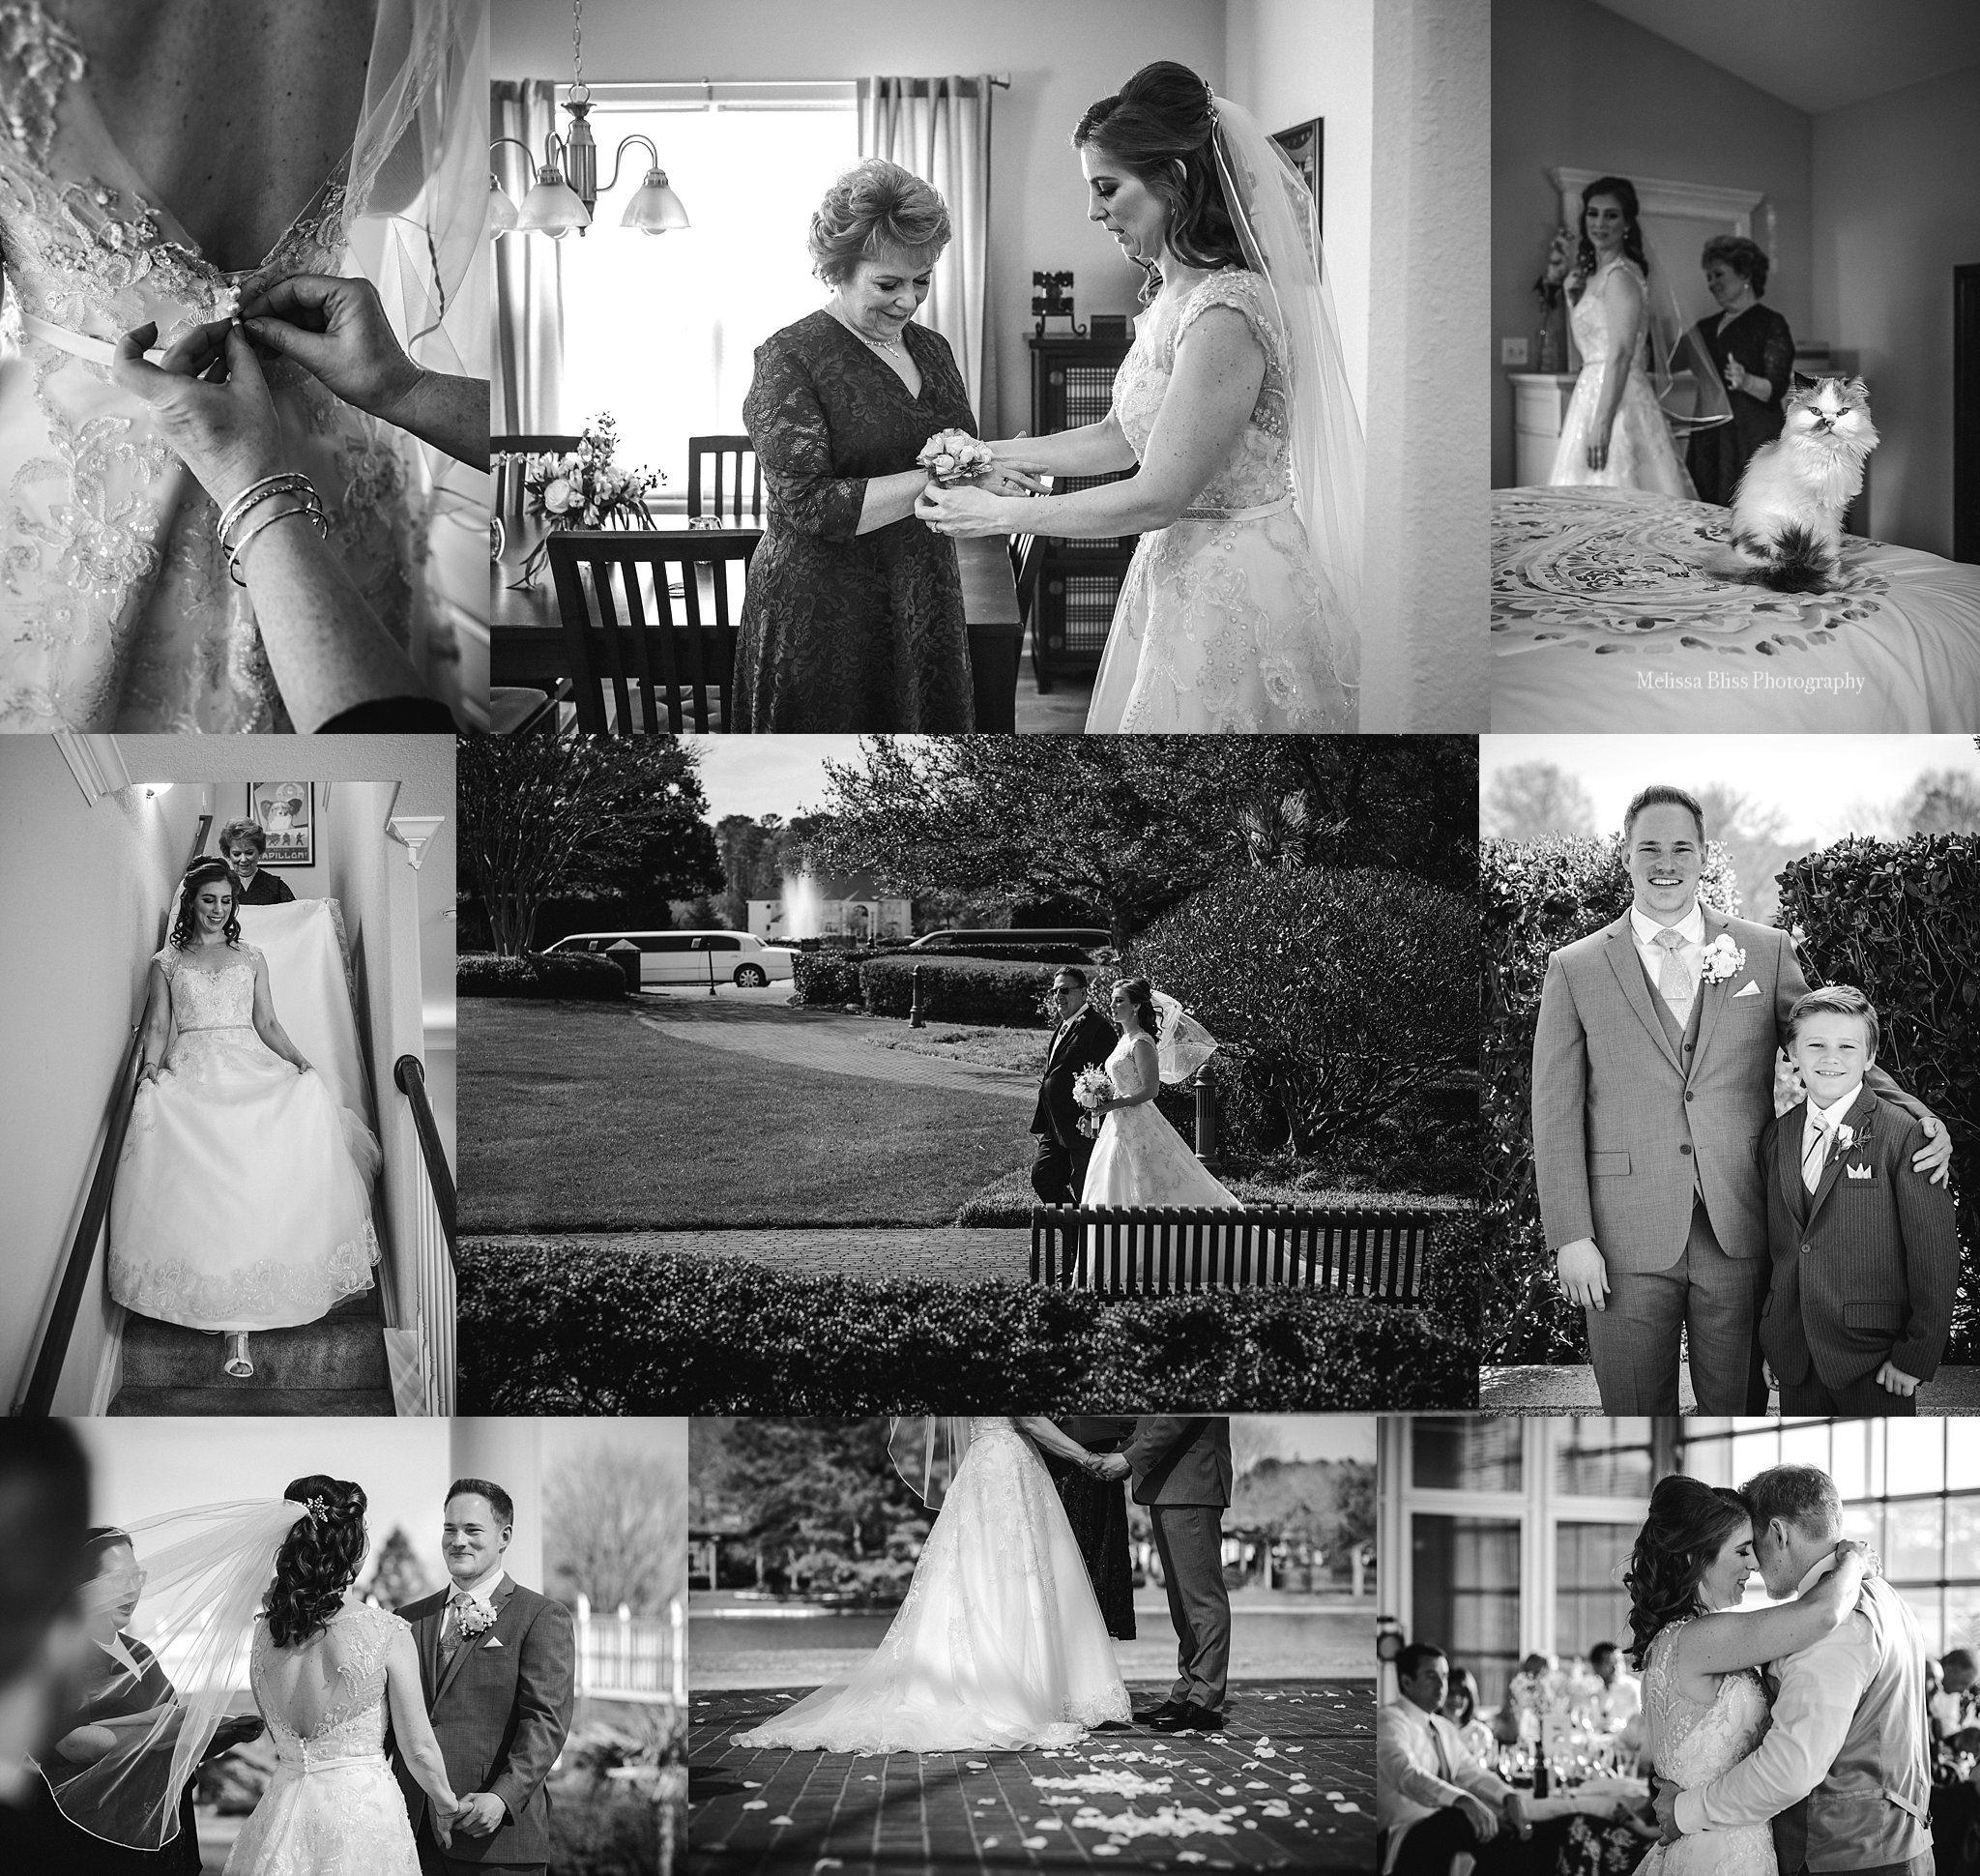 _wedding-day-preparations-Norfolk-wedding-photographer-melissa-bliss-photography.jpg